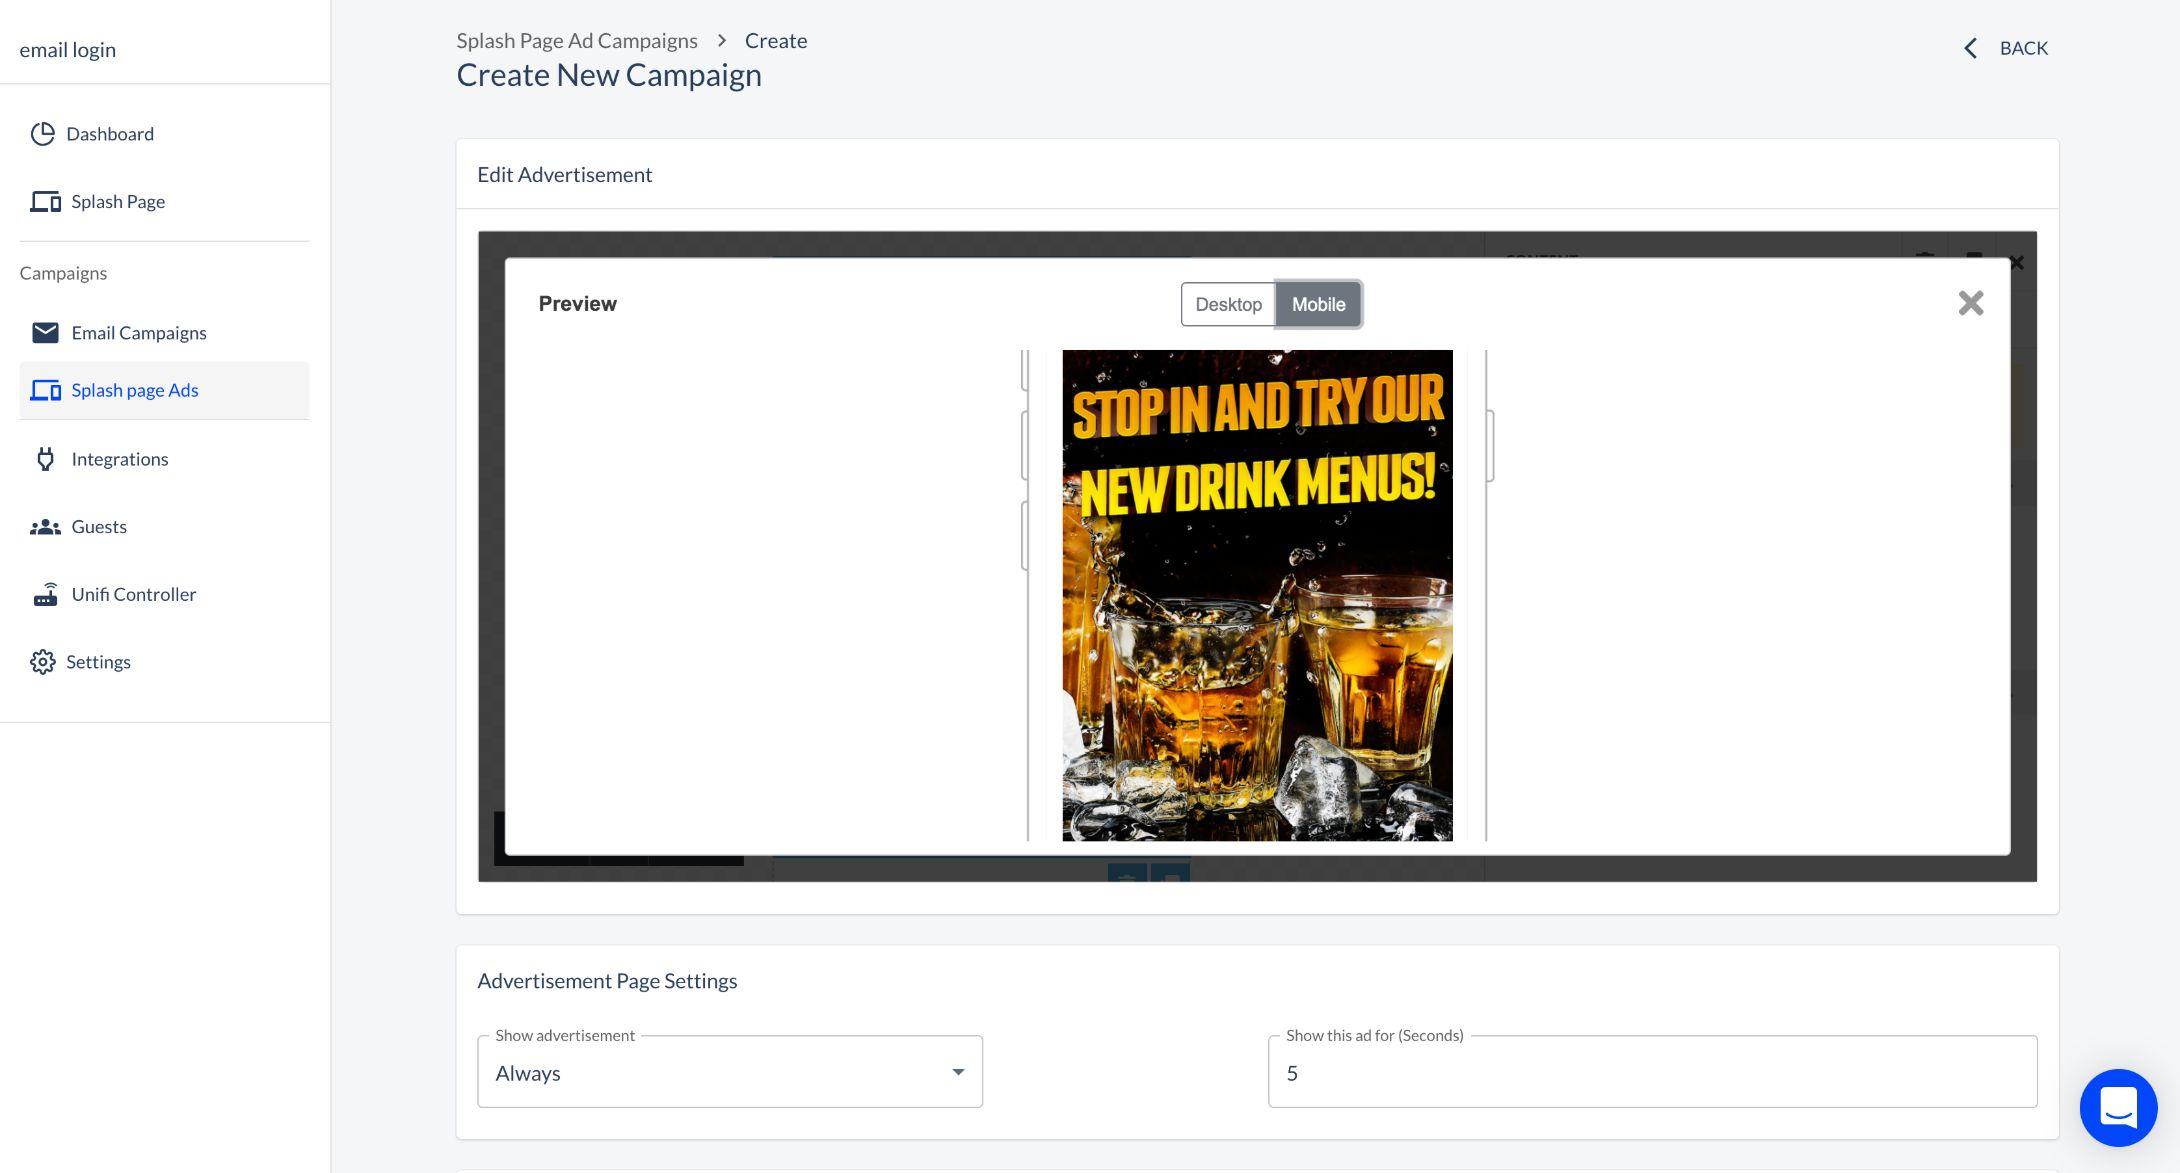 Splashpage campaigns